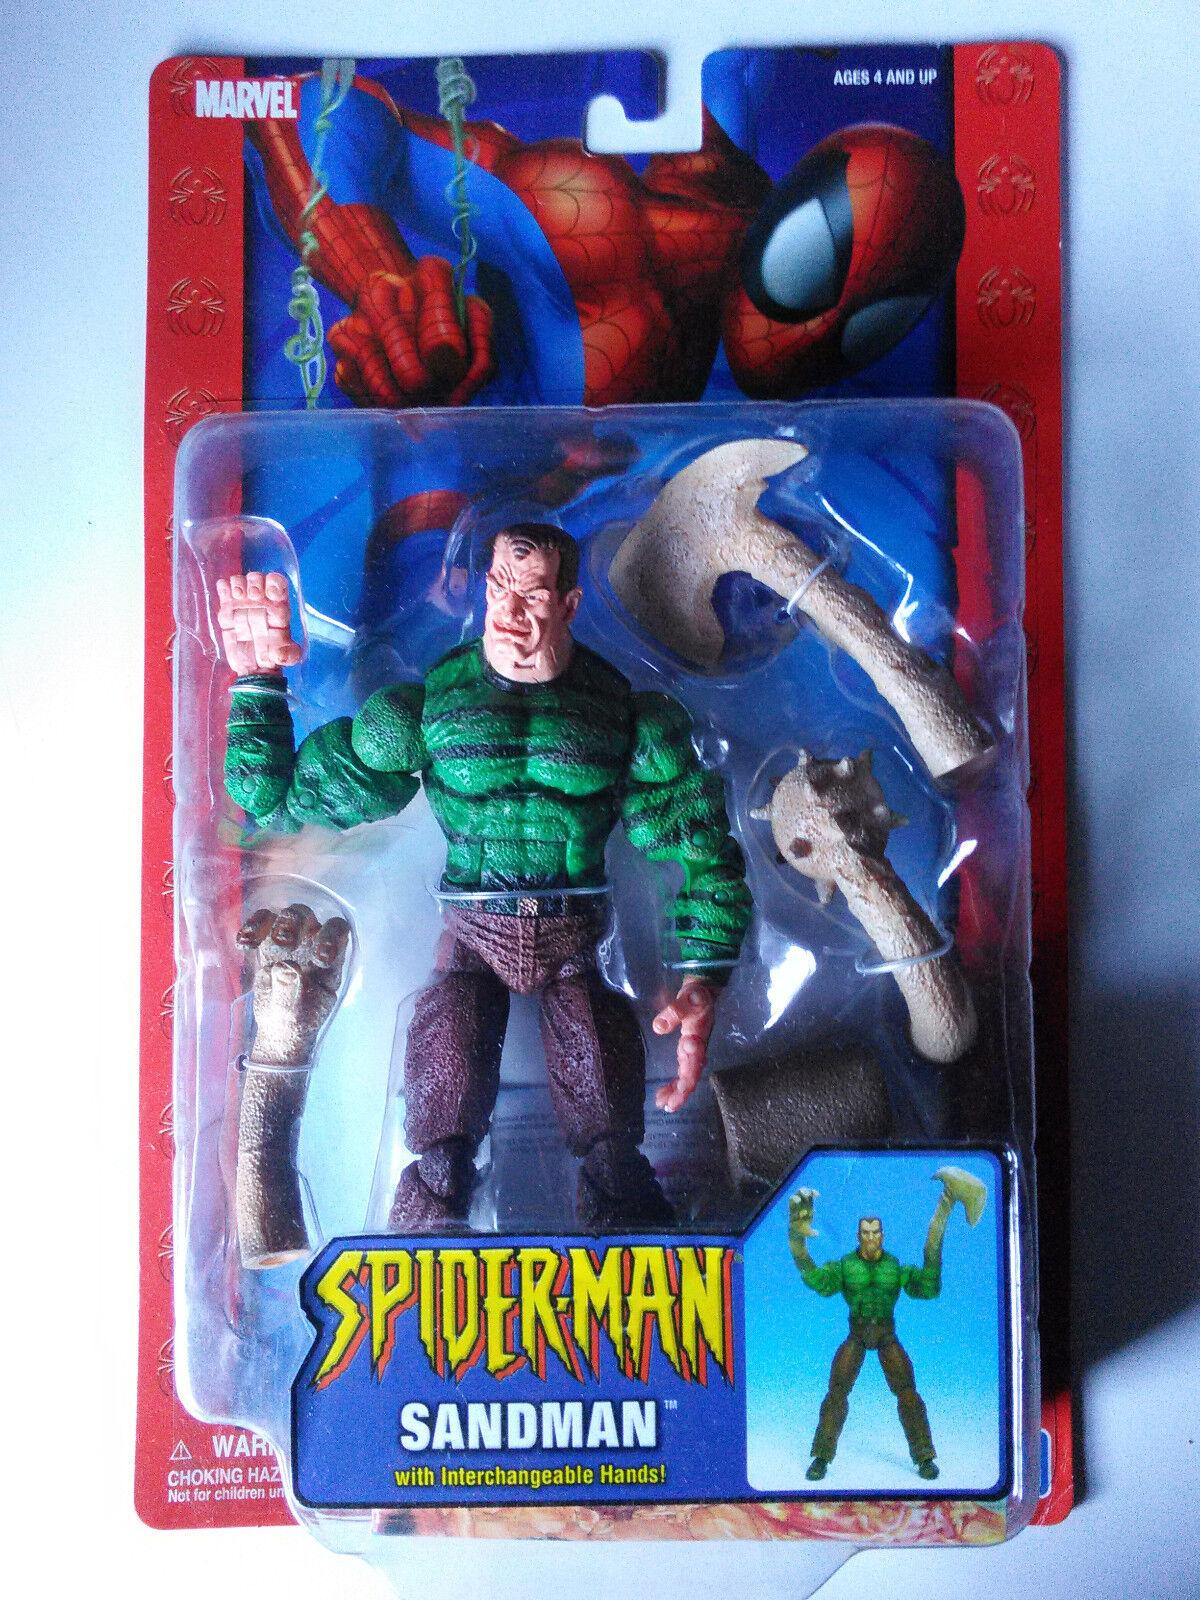 Marvel Sandman SMC Spiderman toybiz  NEW FREE SHIP US